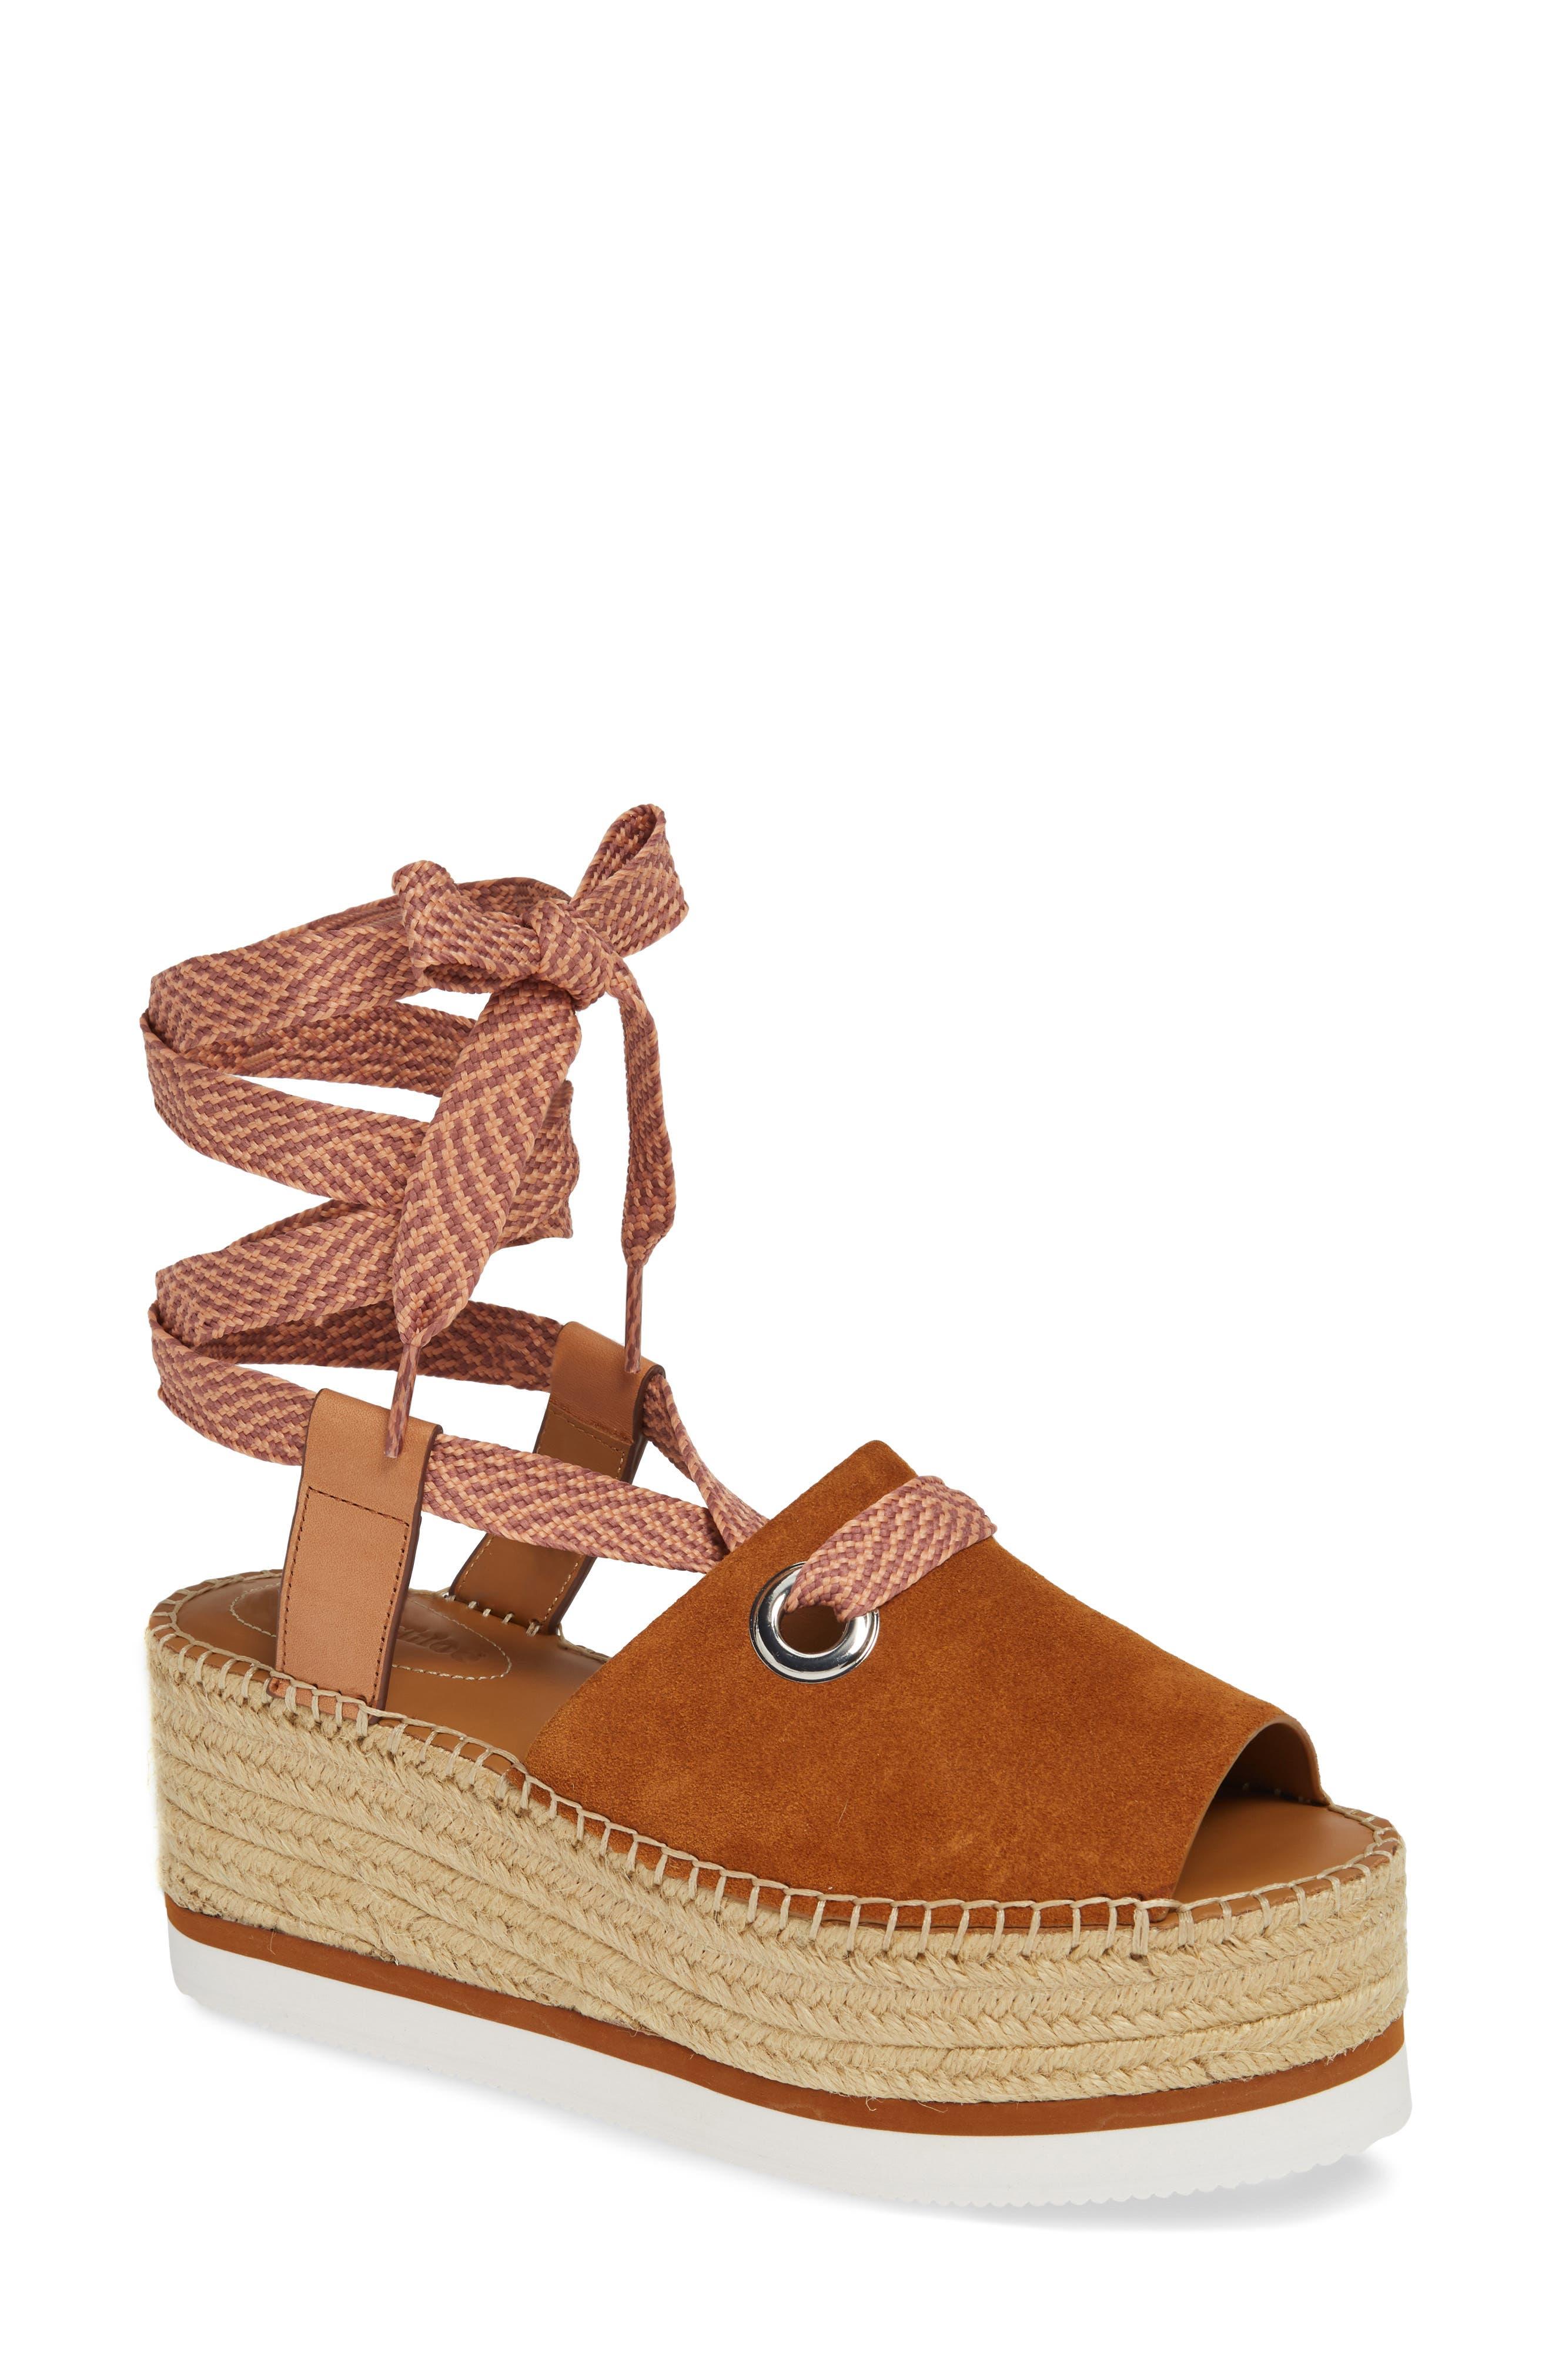 Glyn Amber Platform Ankle Wrap Sandal, Main, color, TAN